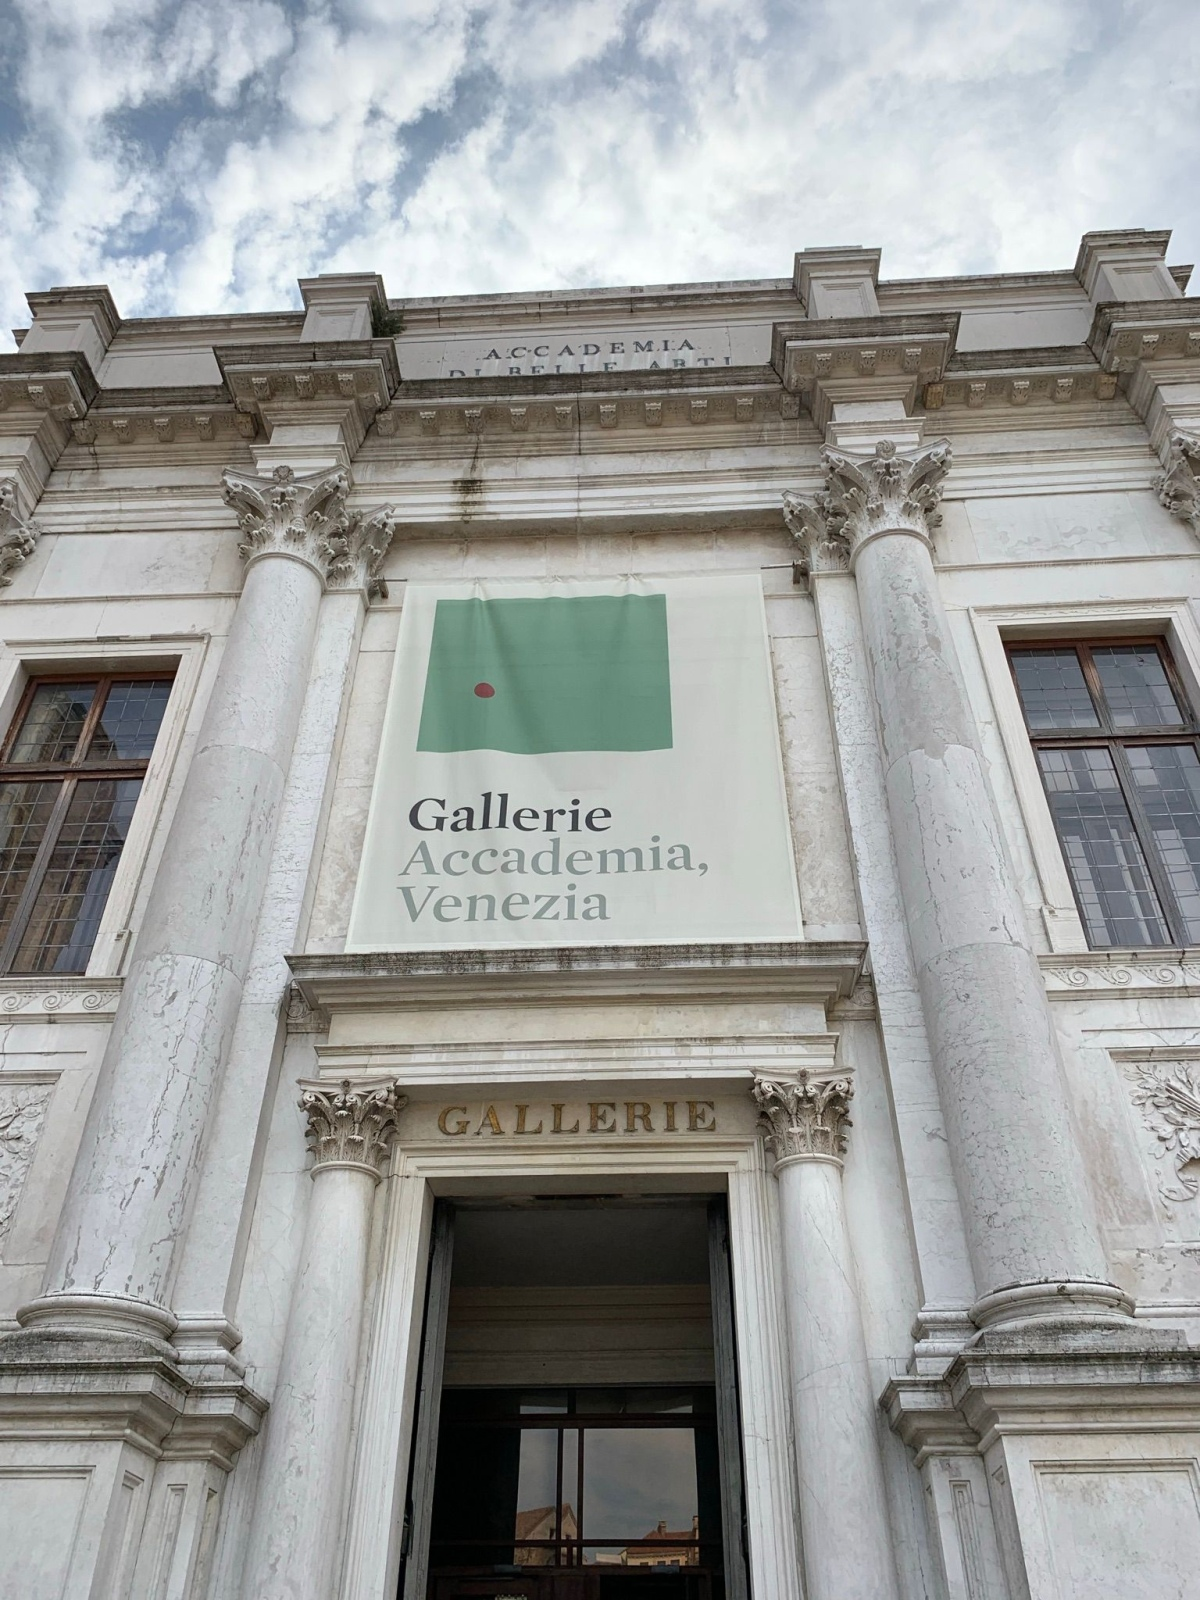 Gallerie Accademia, Venezia